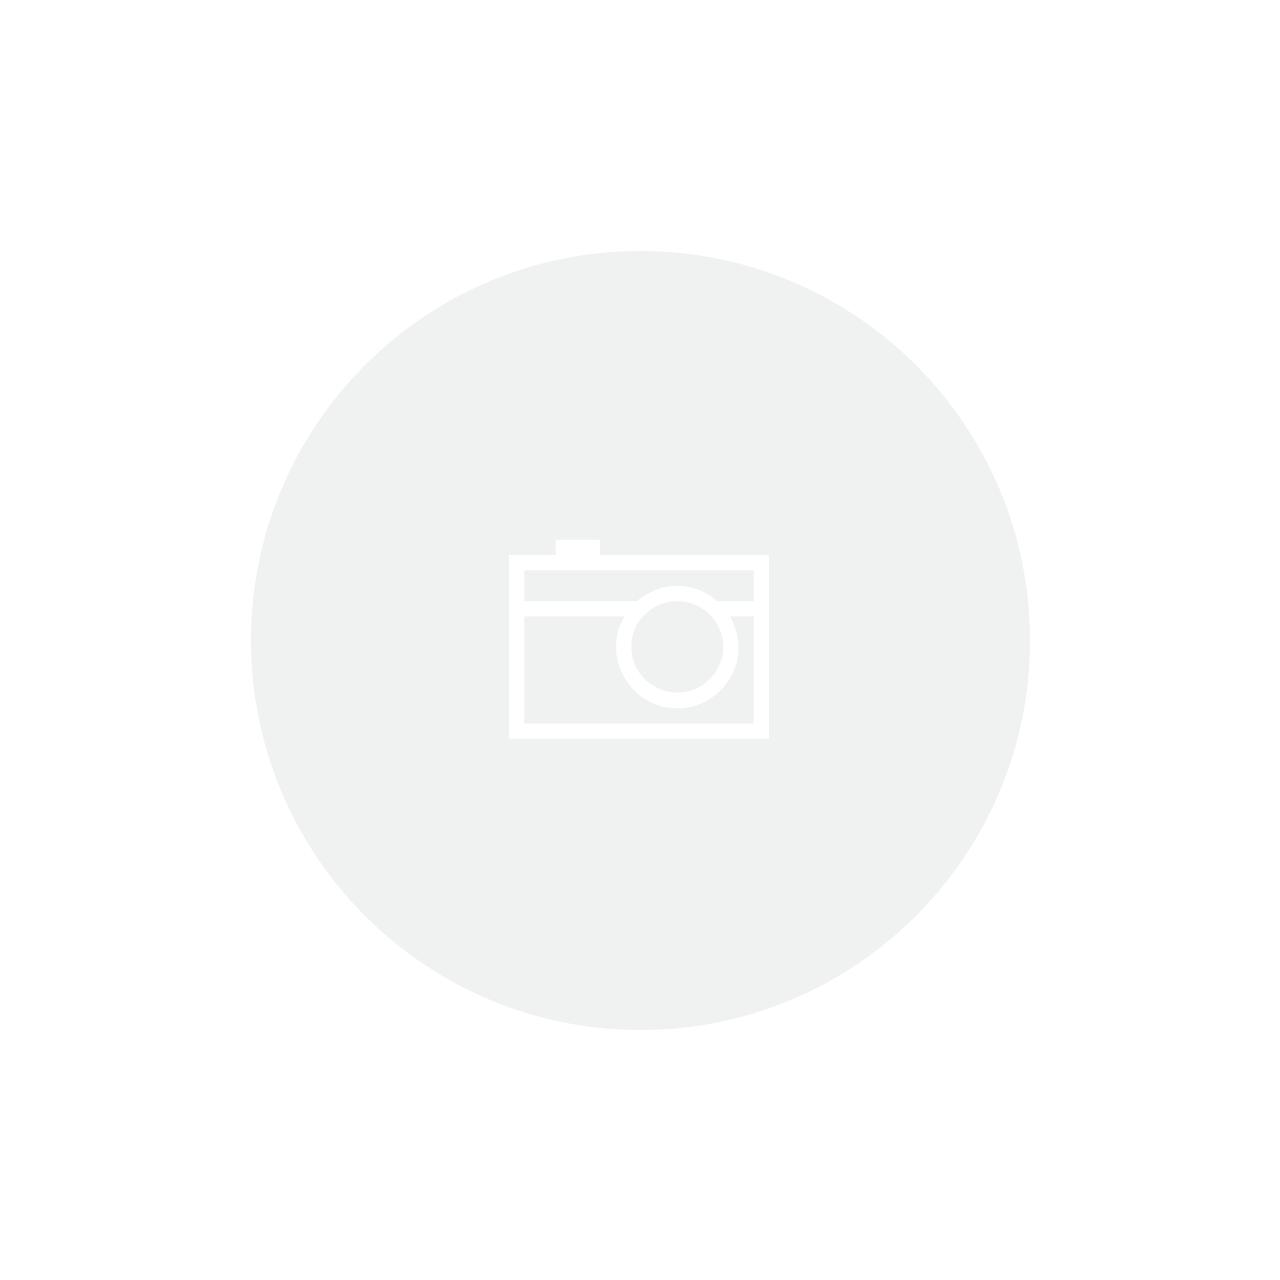 Espumadeira Aço Inox 56cm Tramontina